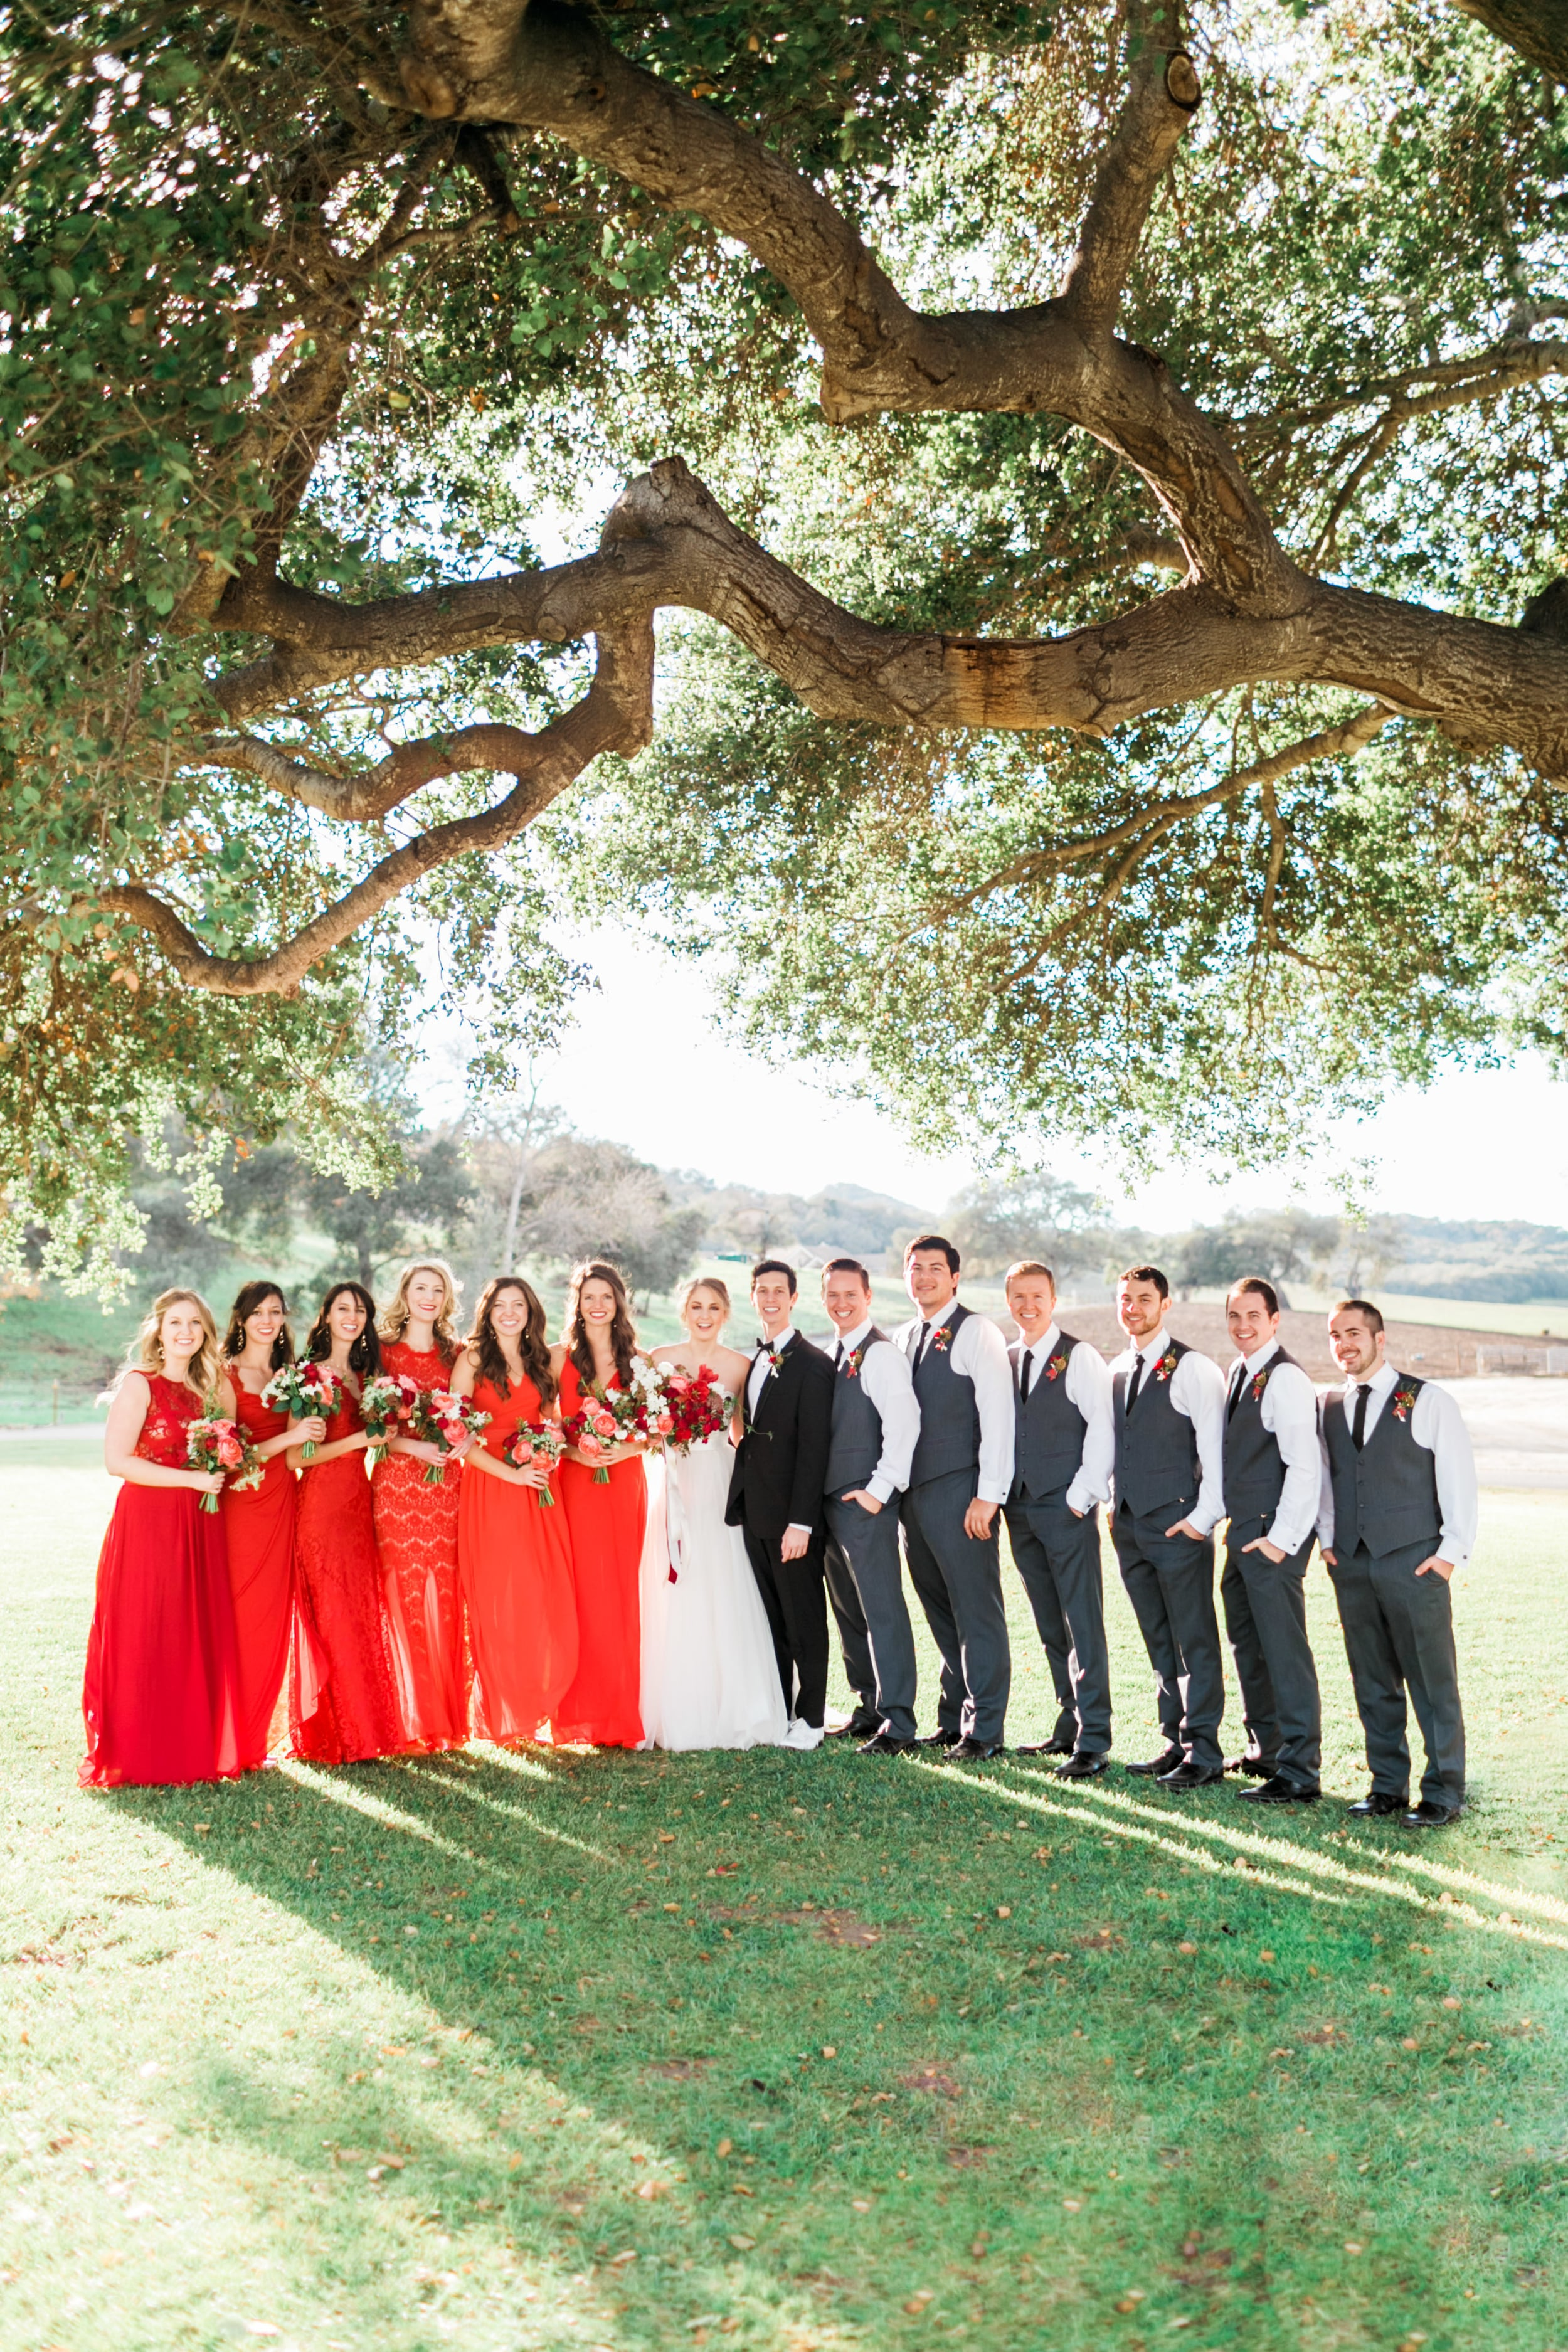 Natalie_Schutt_Photography_Winter_Wedding_San_Luis_Obispo-155.jpg